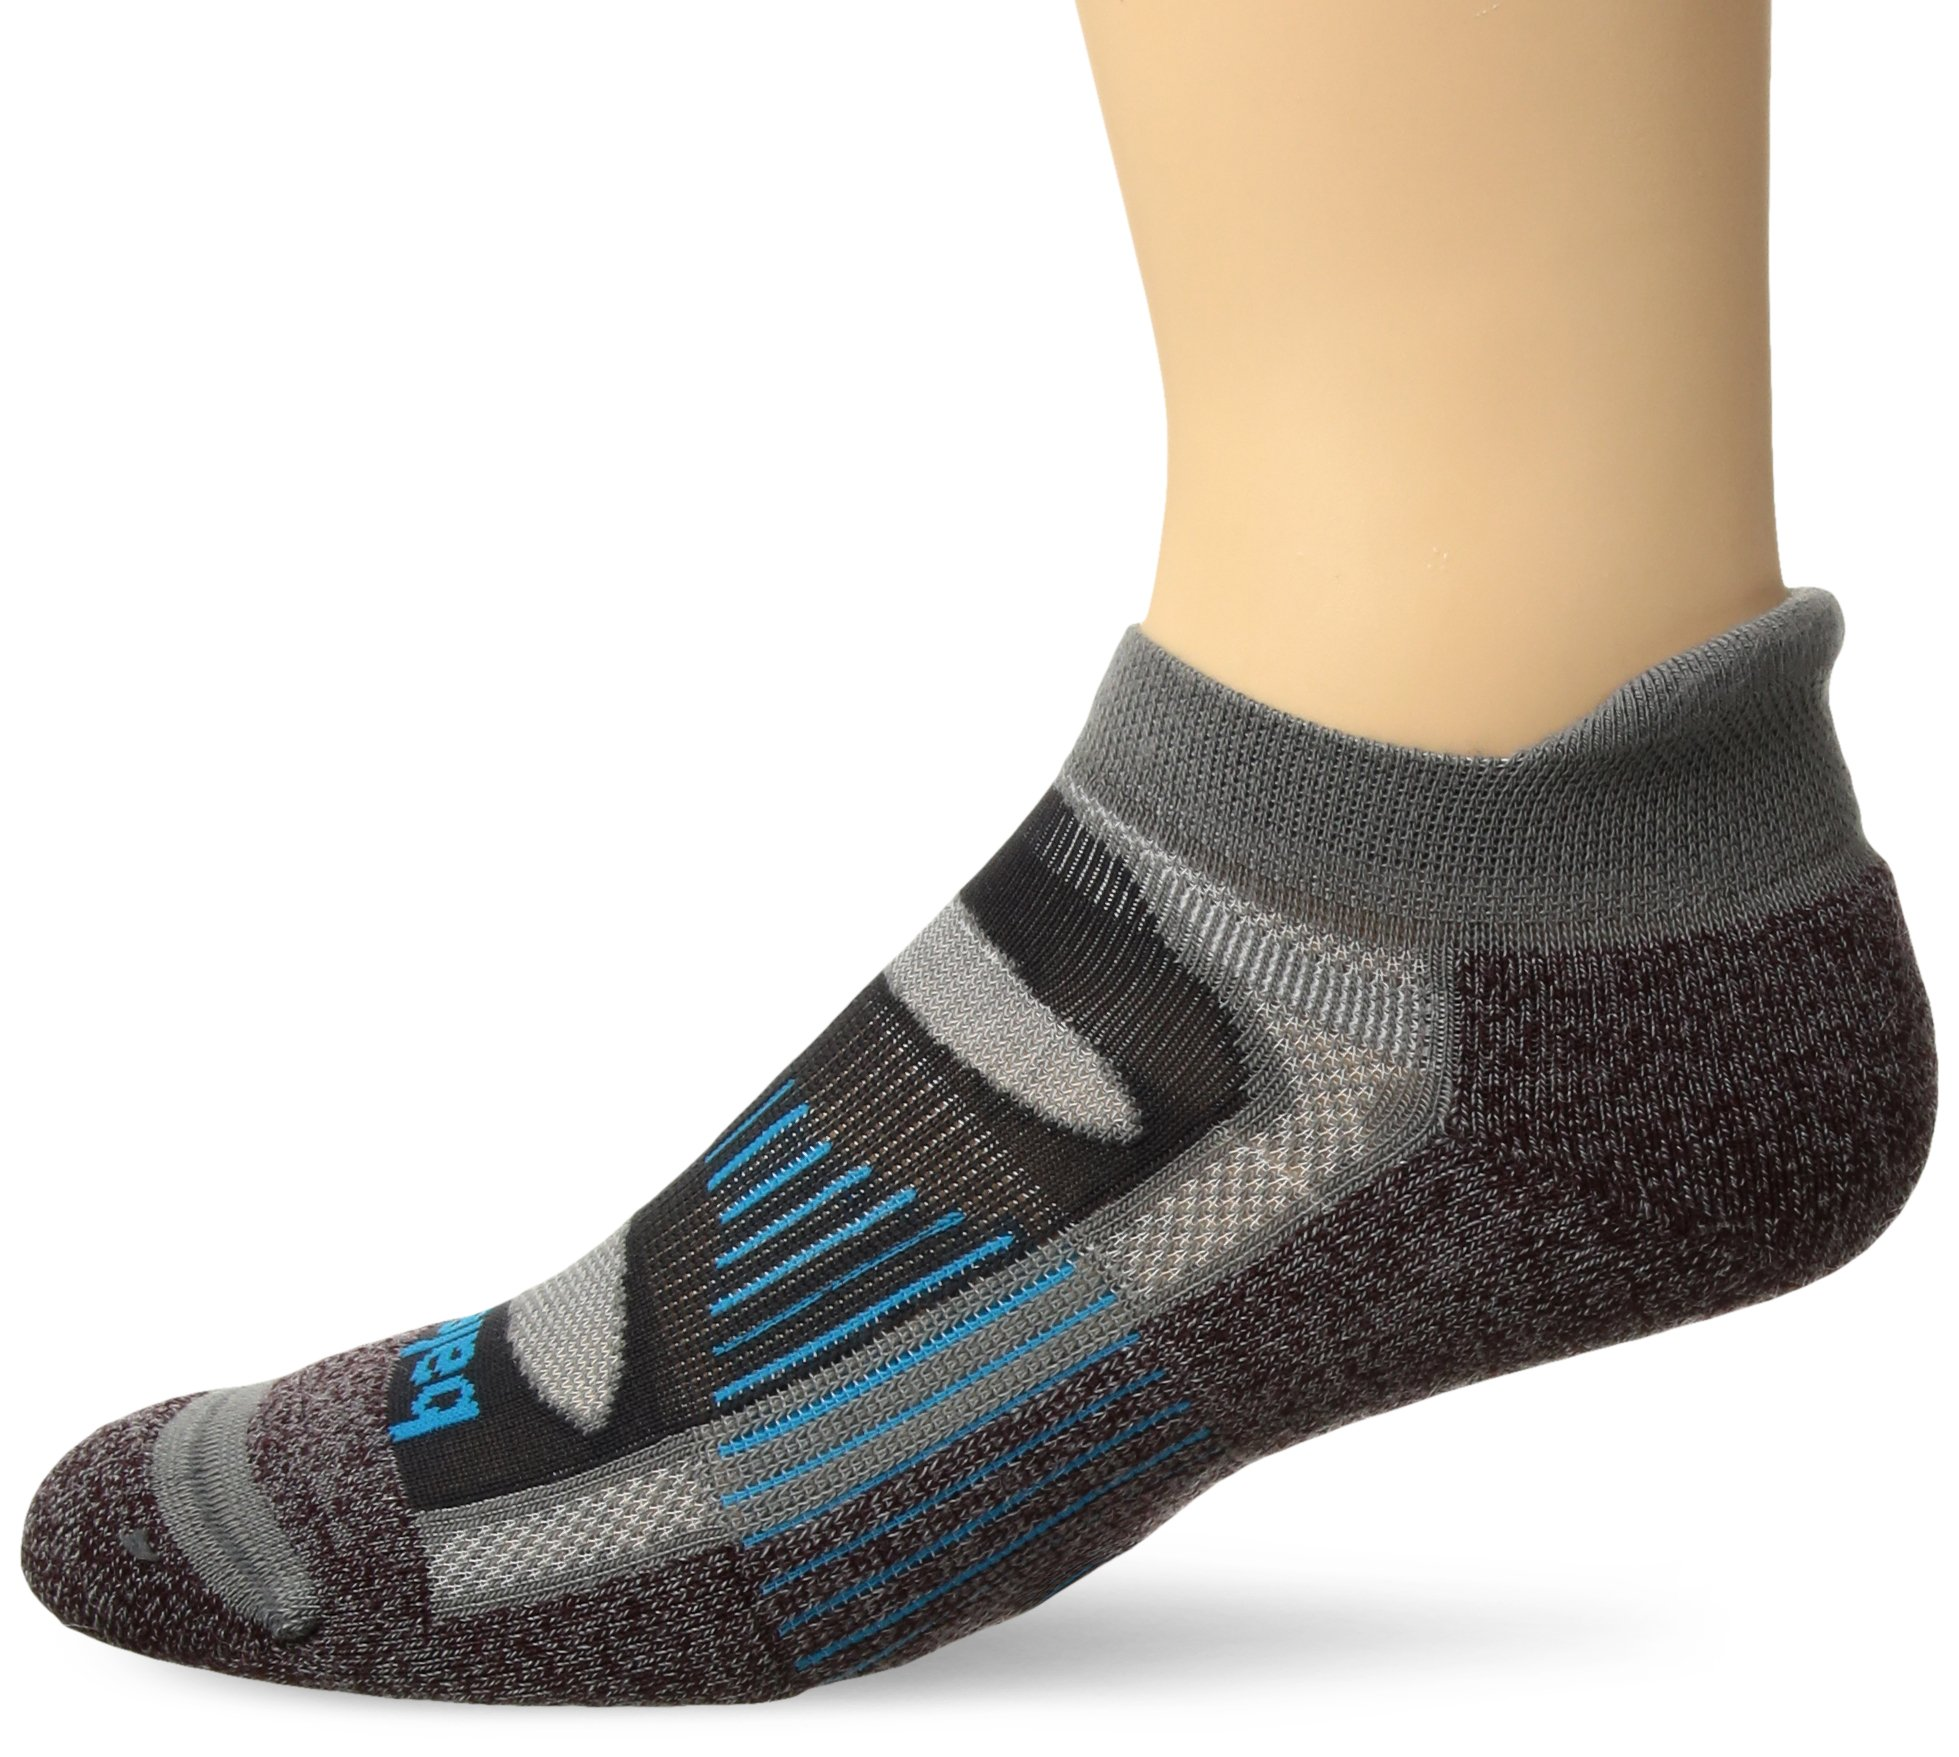 Balega Blister Resist No Show Socks For Men and Women (1-Pair), Chocolate, Small